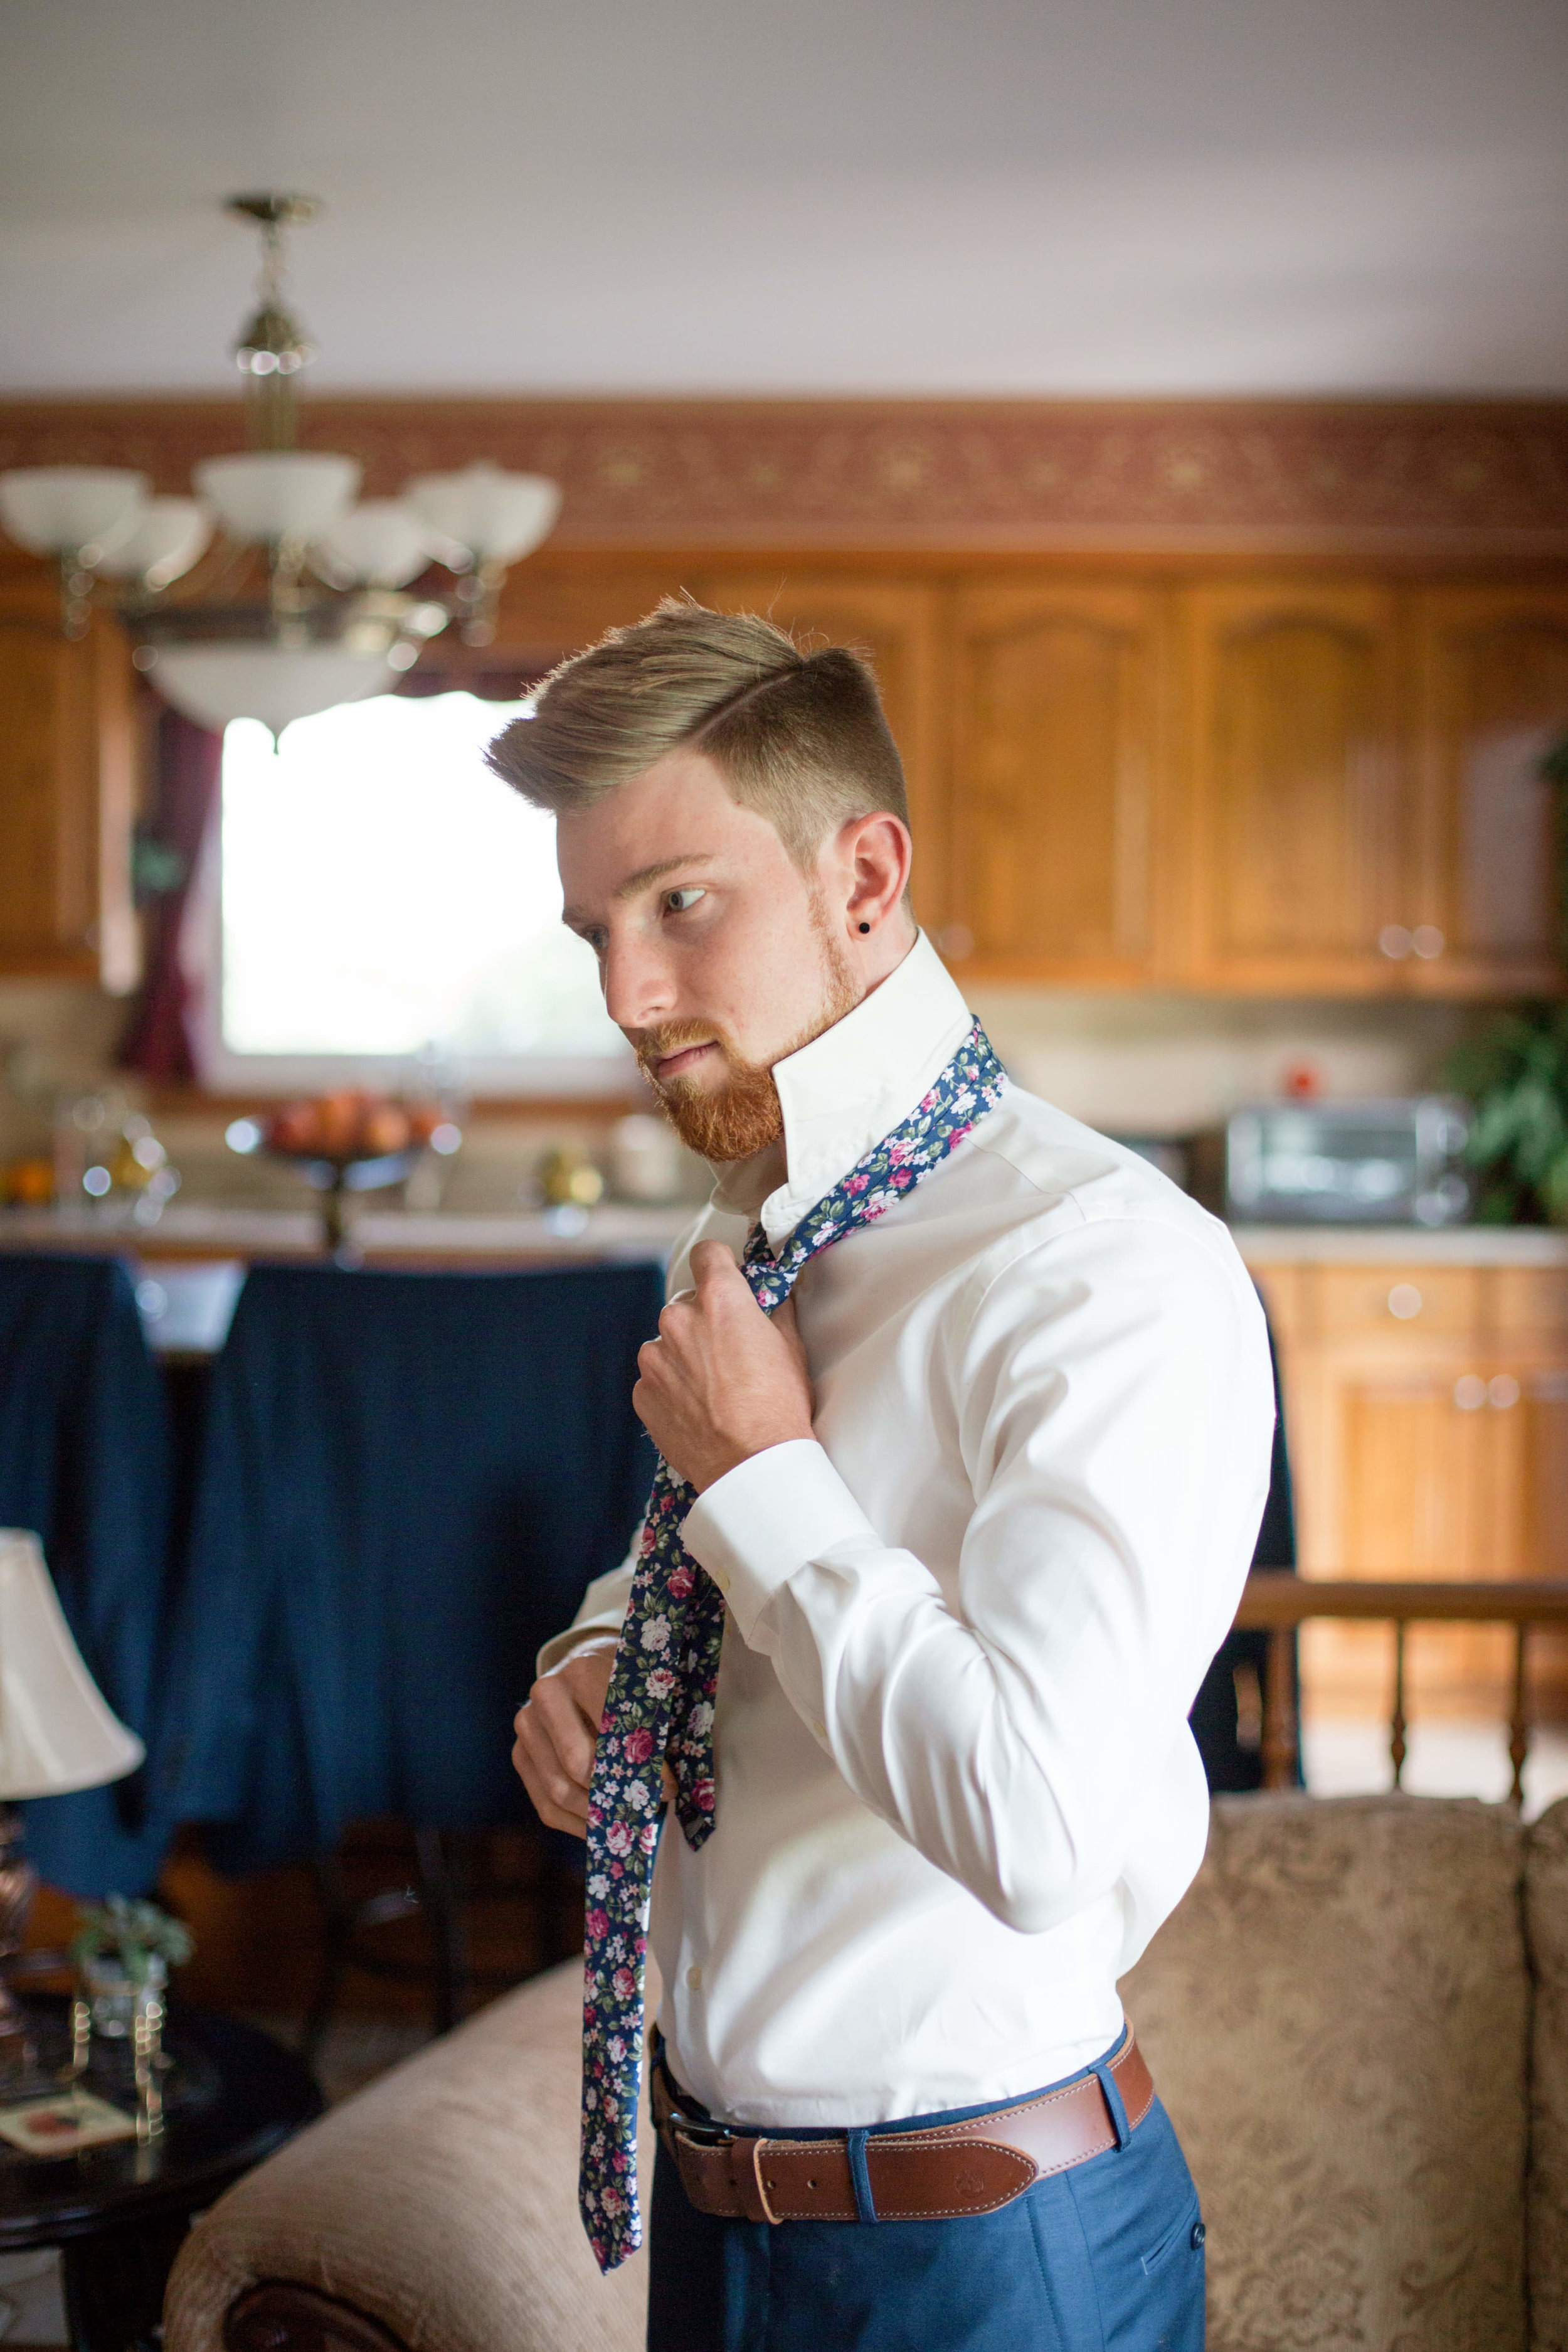 Maddy___Brandon___Daniel_Ricci_Weddings_High_Res._Finals_35.jpg